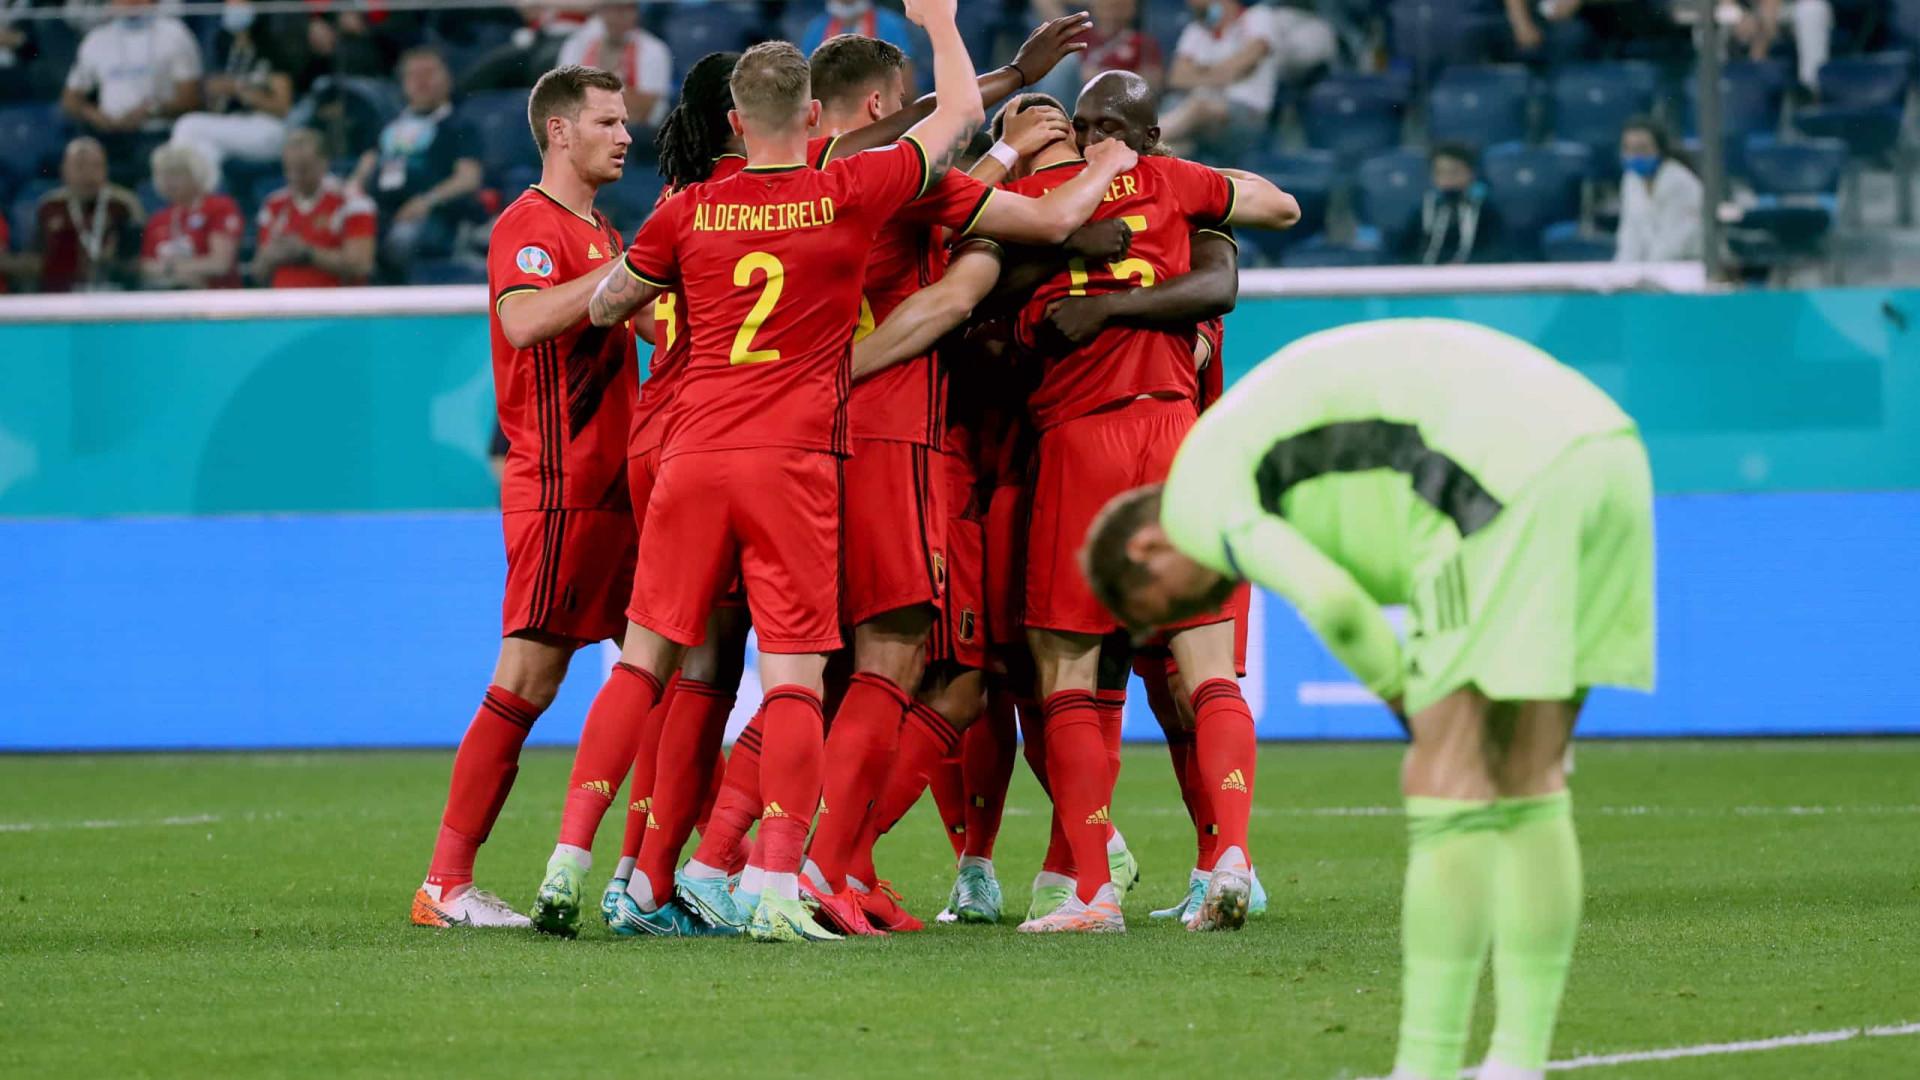 Bélgica entra a todo o vapor no Euro'2020 e derrota a Rússia